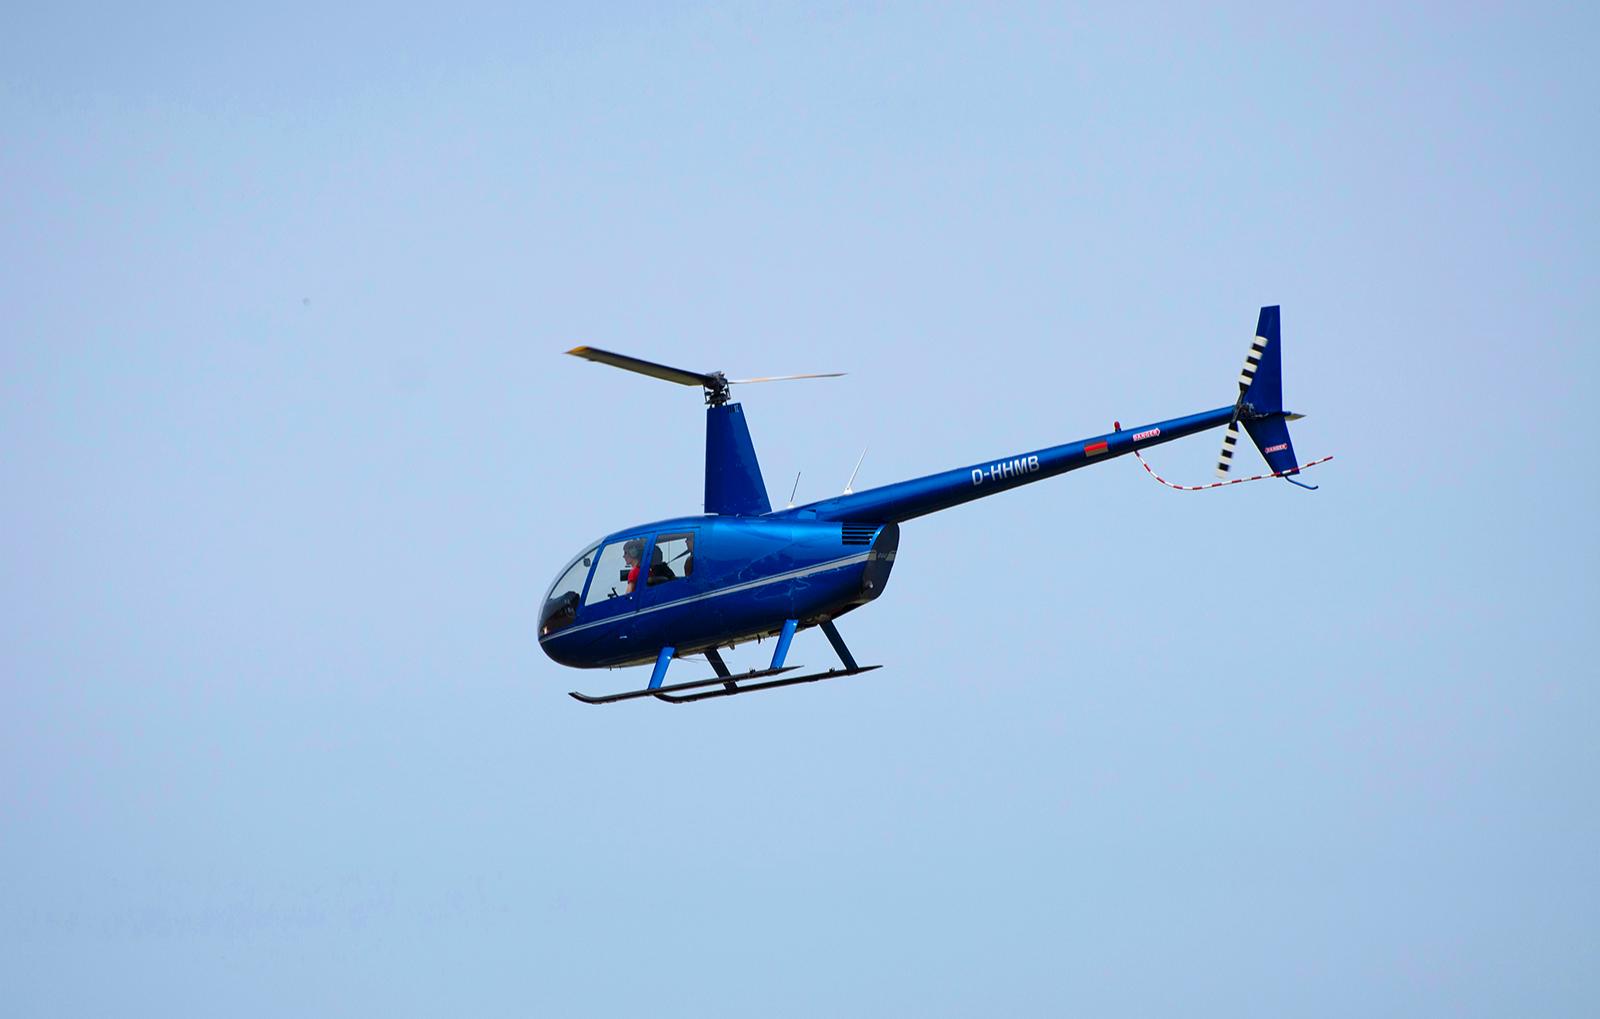 hubschrauber-fliegen-grosspoesna-bg4